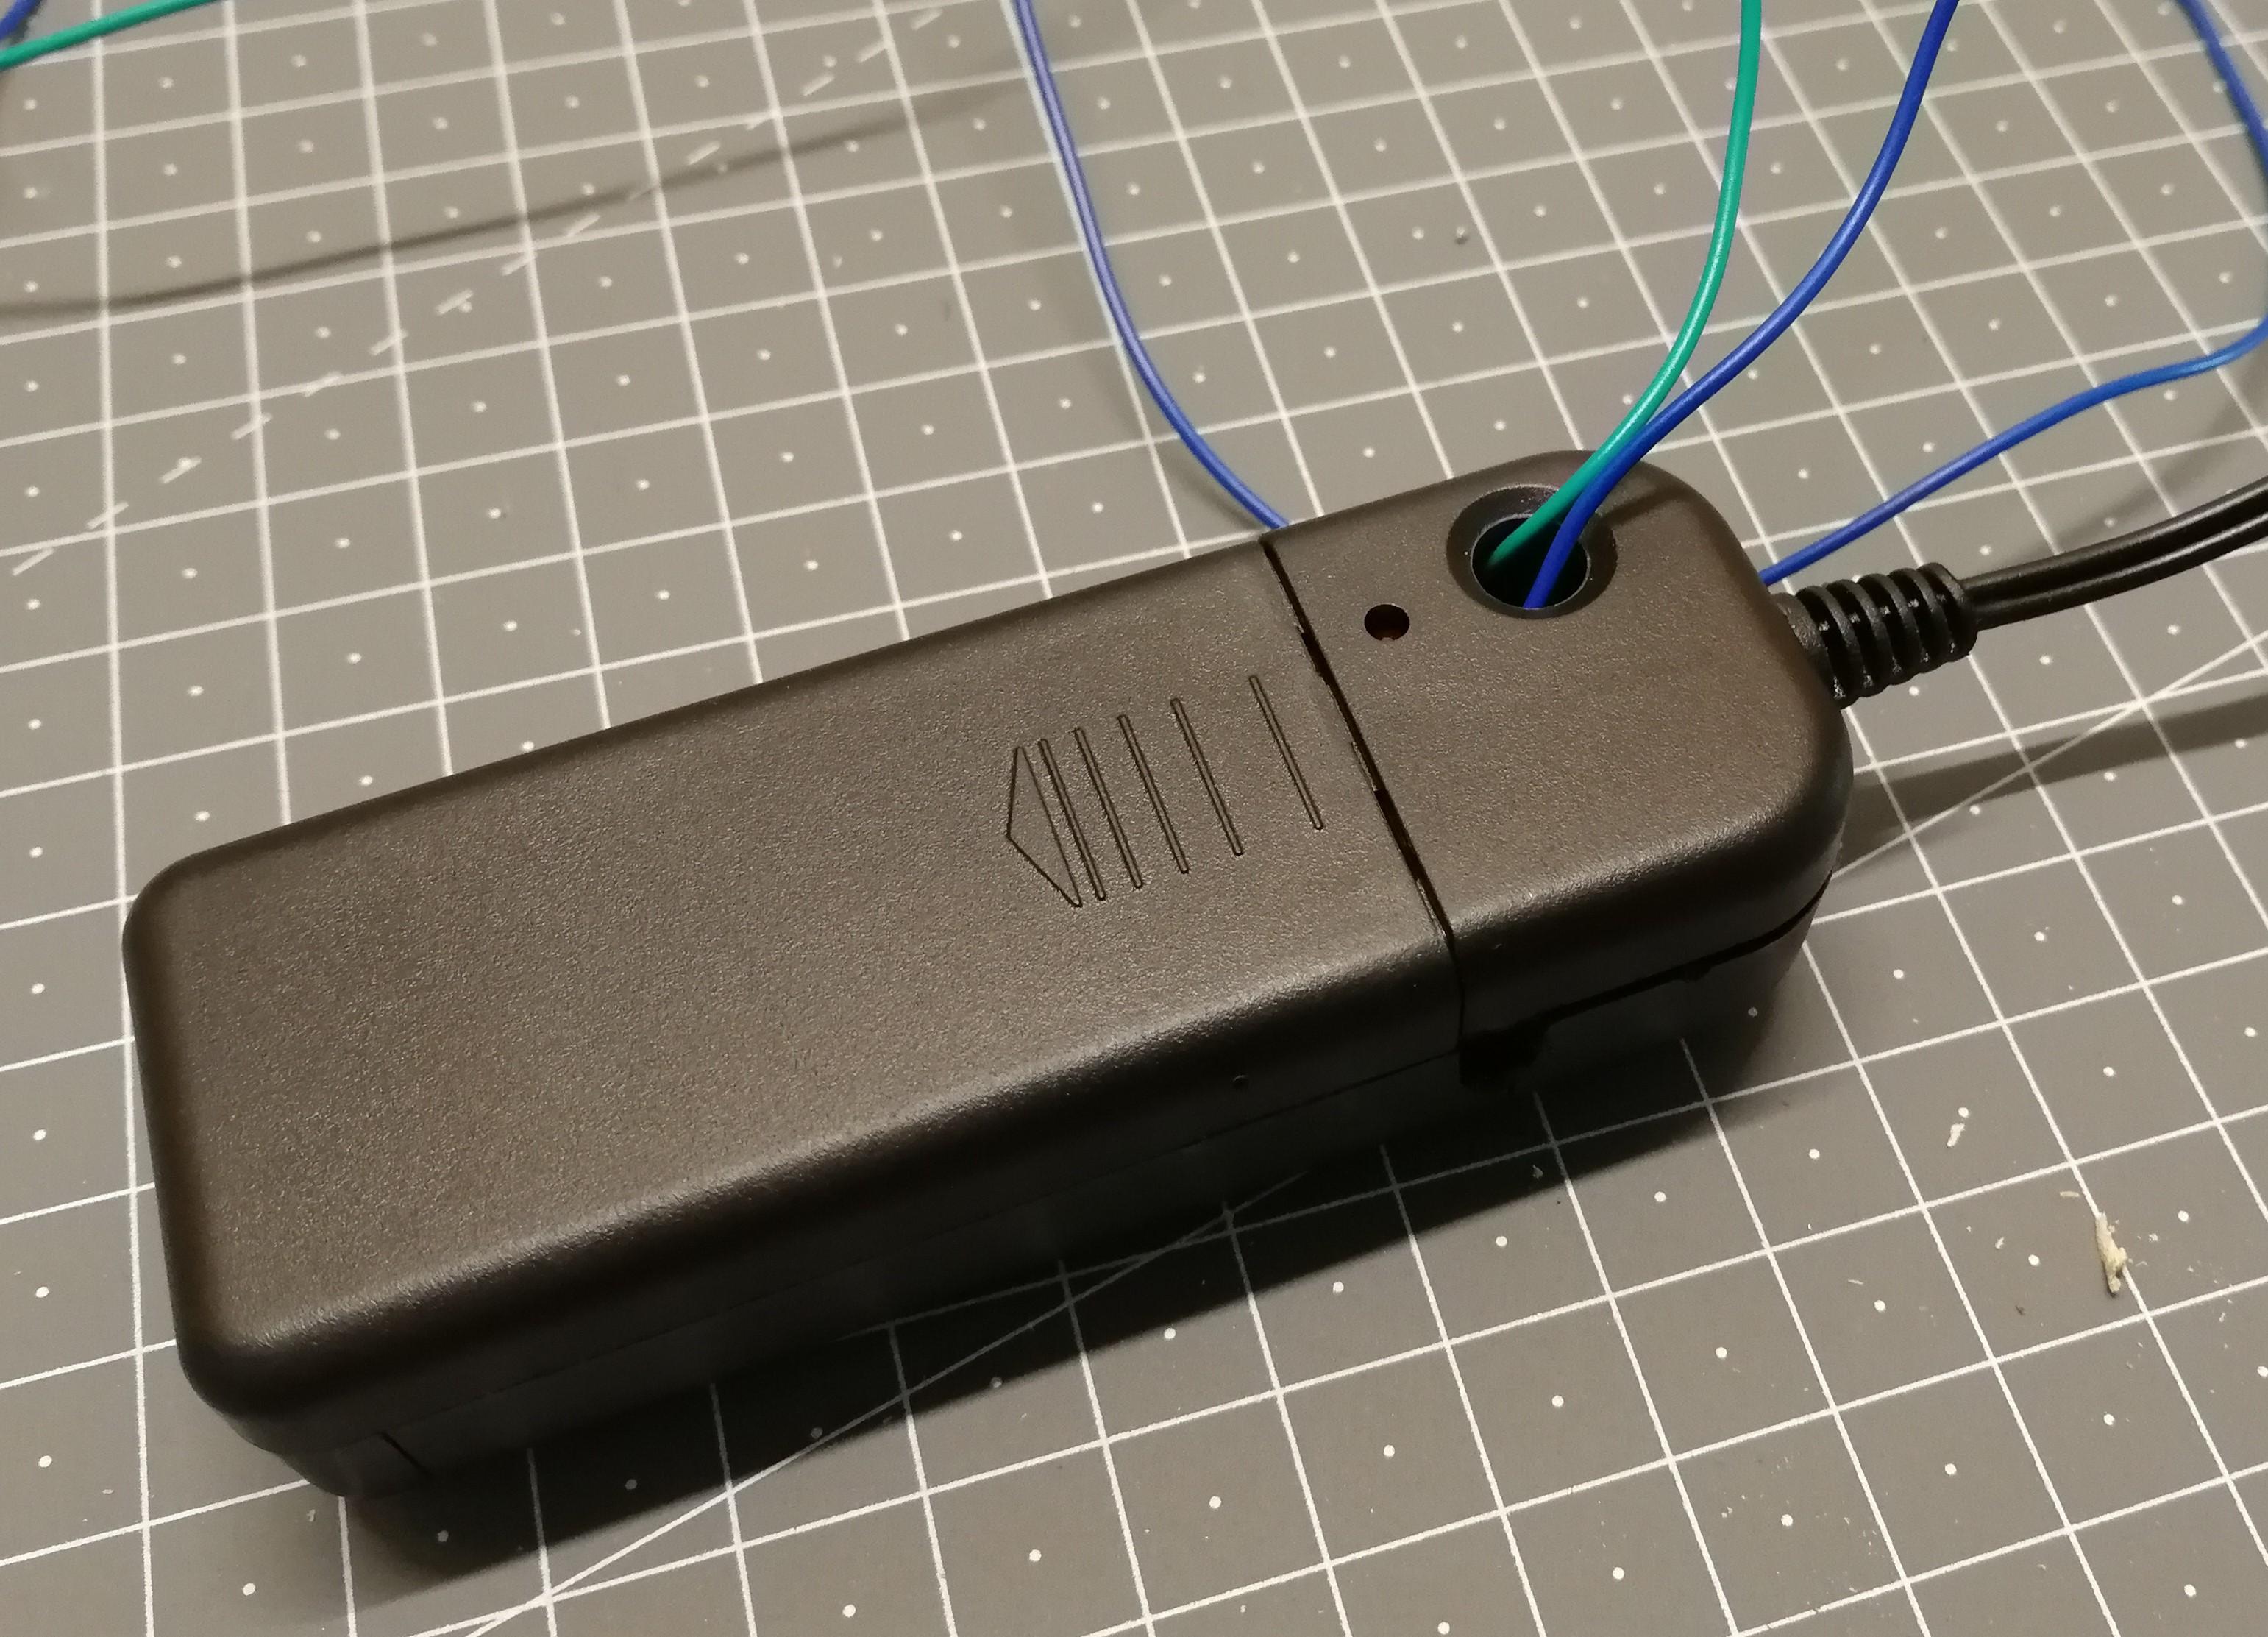 Hacking an el wire inverter splitbrain